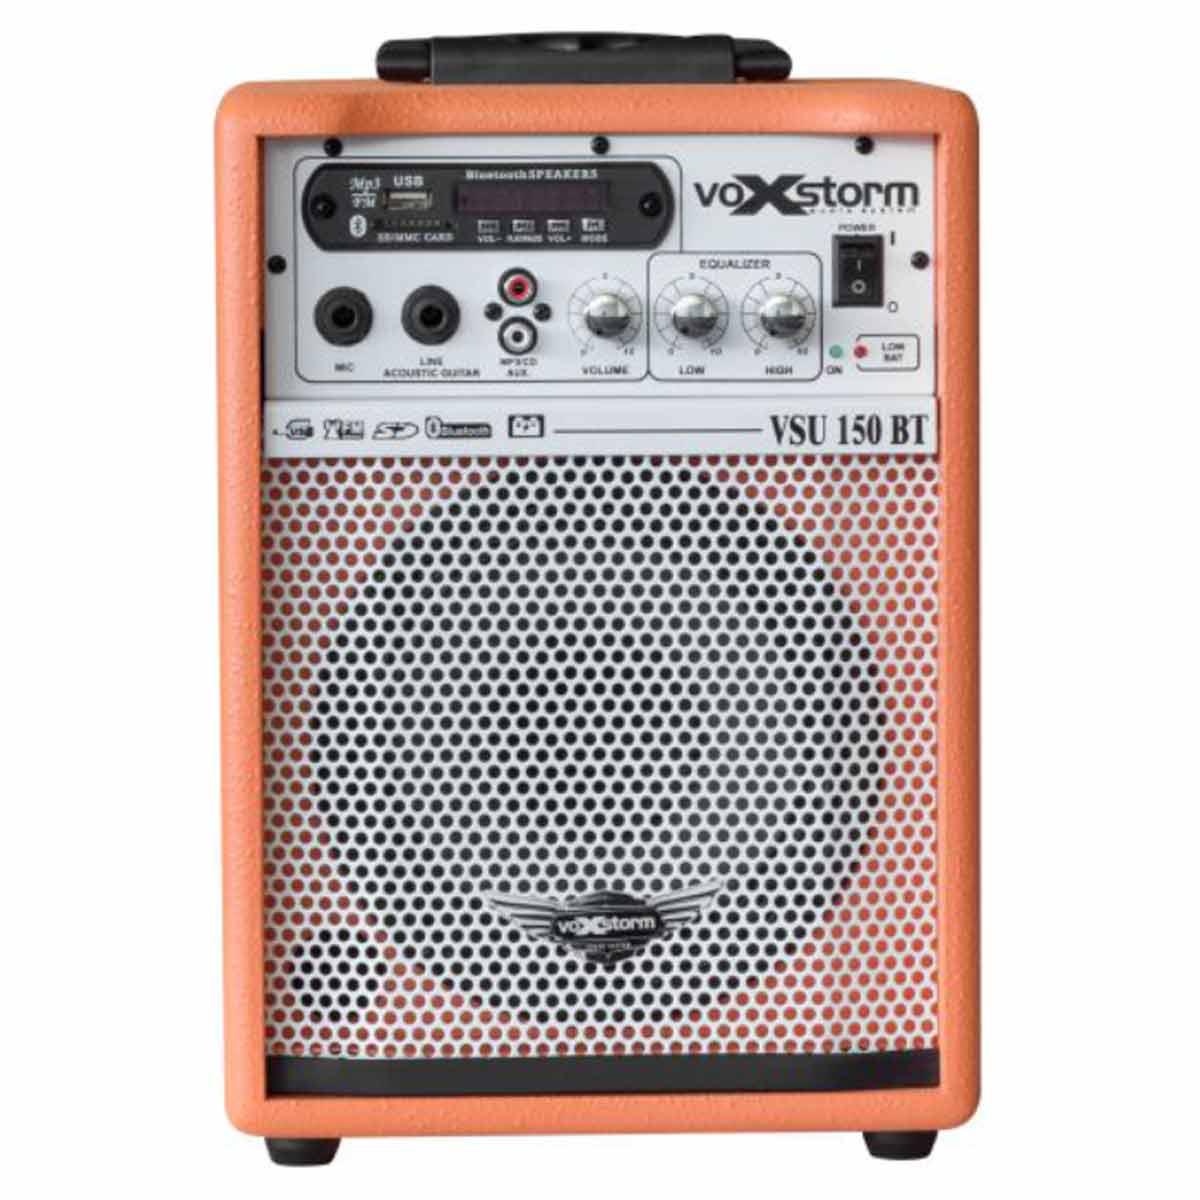 VSU150BT - Cubo Multiuso Ativo 15W c/ Bateria Interna, Bluetooth e USB VSU 150 BT Laranja - Voxstorm